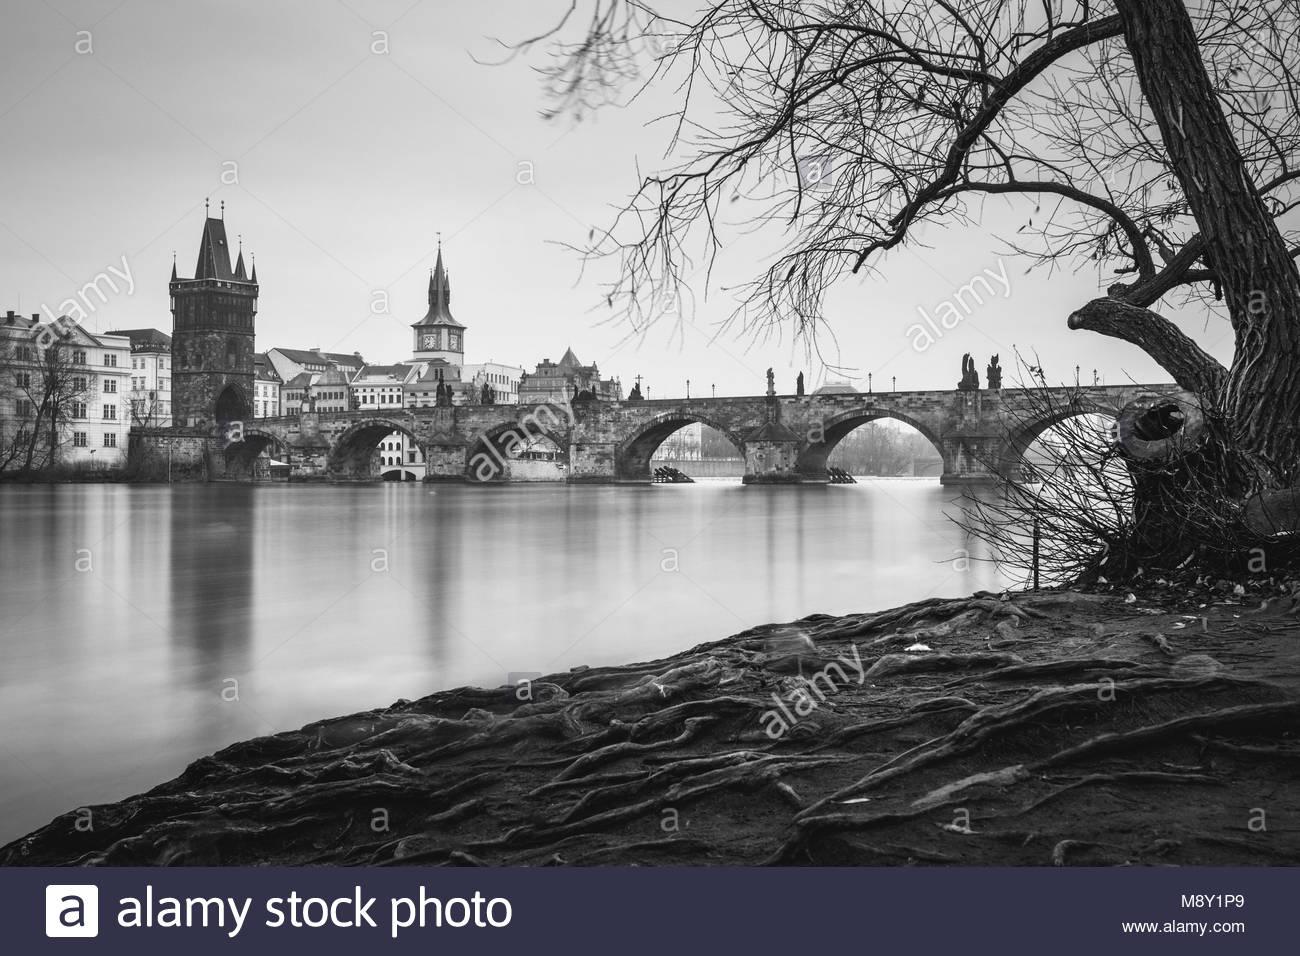 Winter morning view on Charles Bridge, Prague, Czech Republic - Stock Image